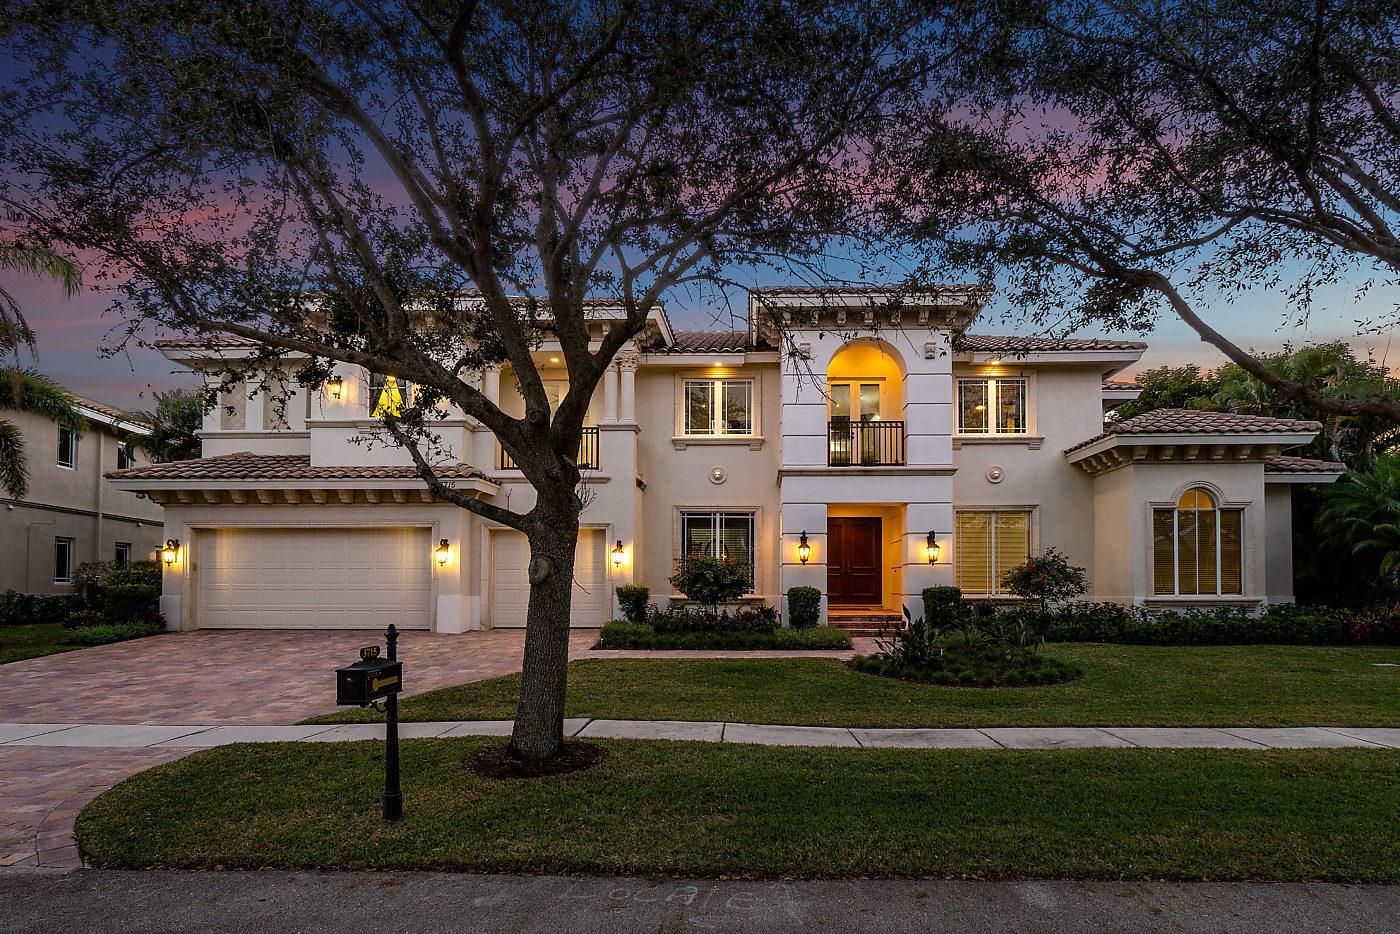 Photo of 3715 Kings Way, Boca Raton, FL 33434